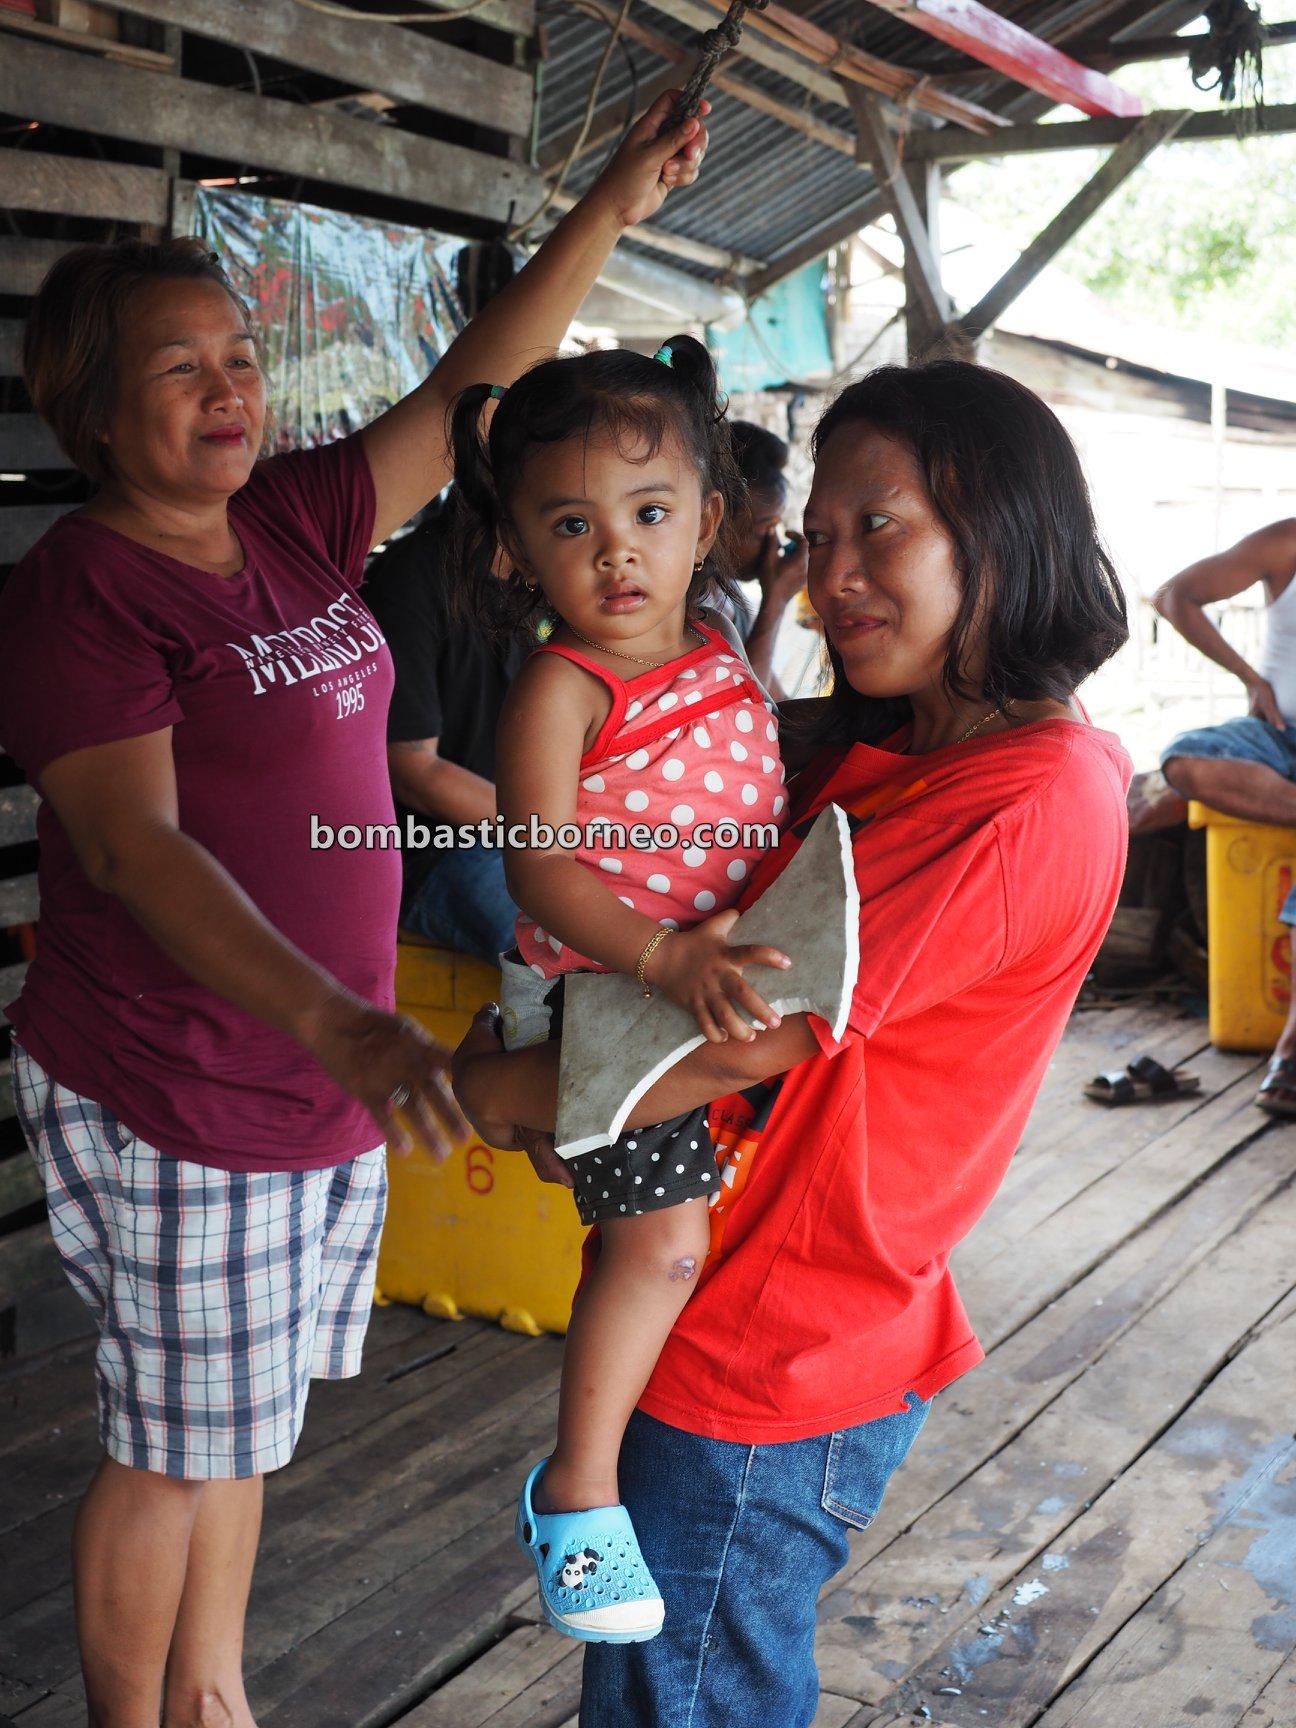 Kampung Nelayan Melayu, Malay Fishing Village, tradisional, traditional, seafood, Tourism, travel guide, Borneo, 婆罗洲印尼西加里曼丹, 山口洋马来渔村